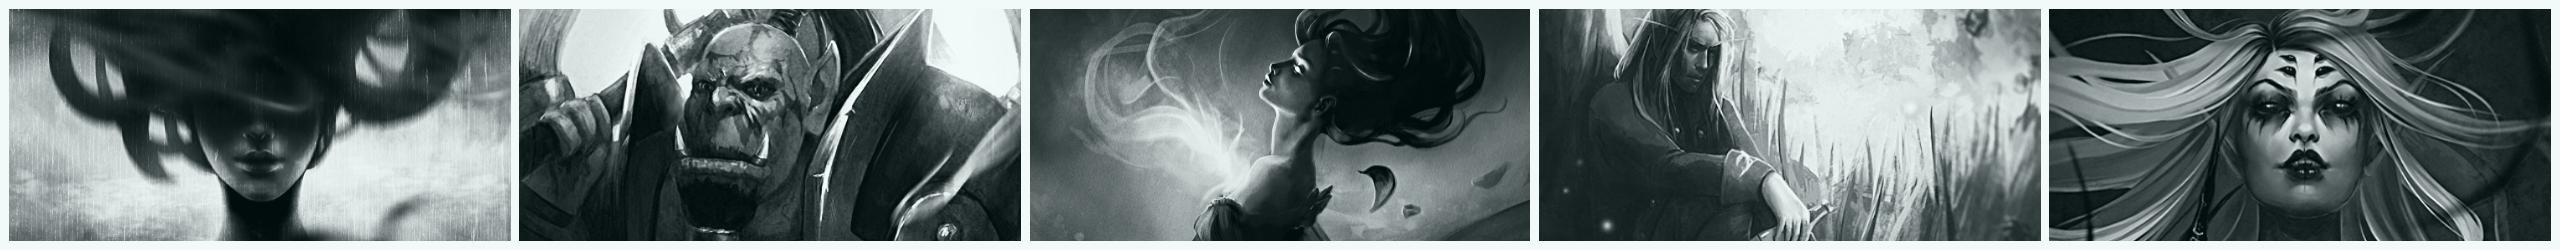 Lenamo's illustration black and white